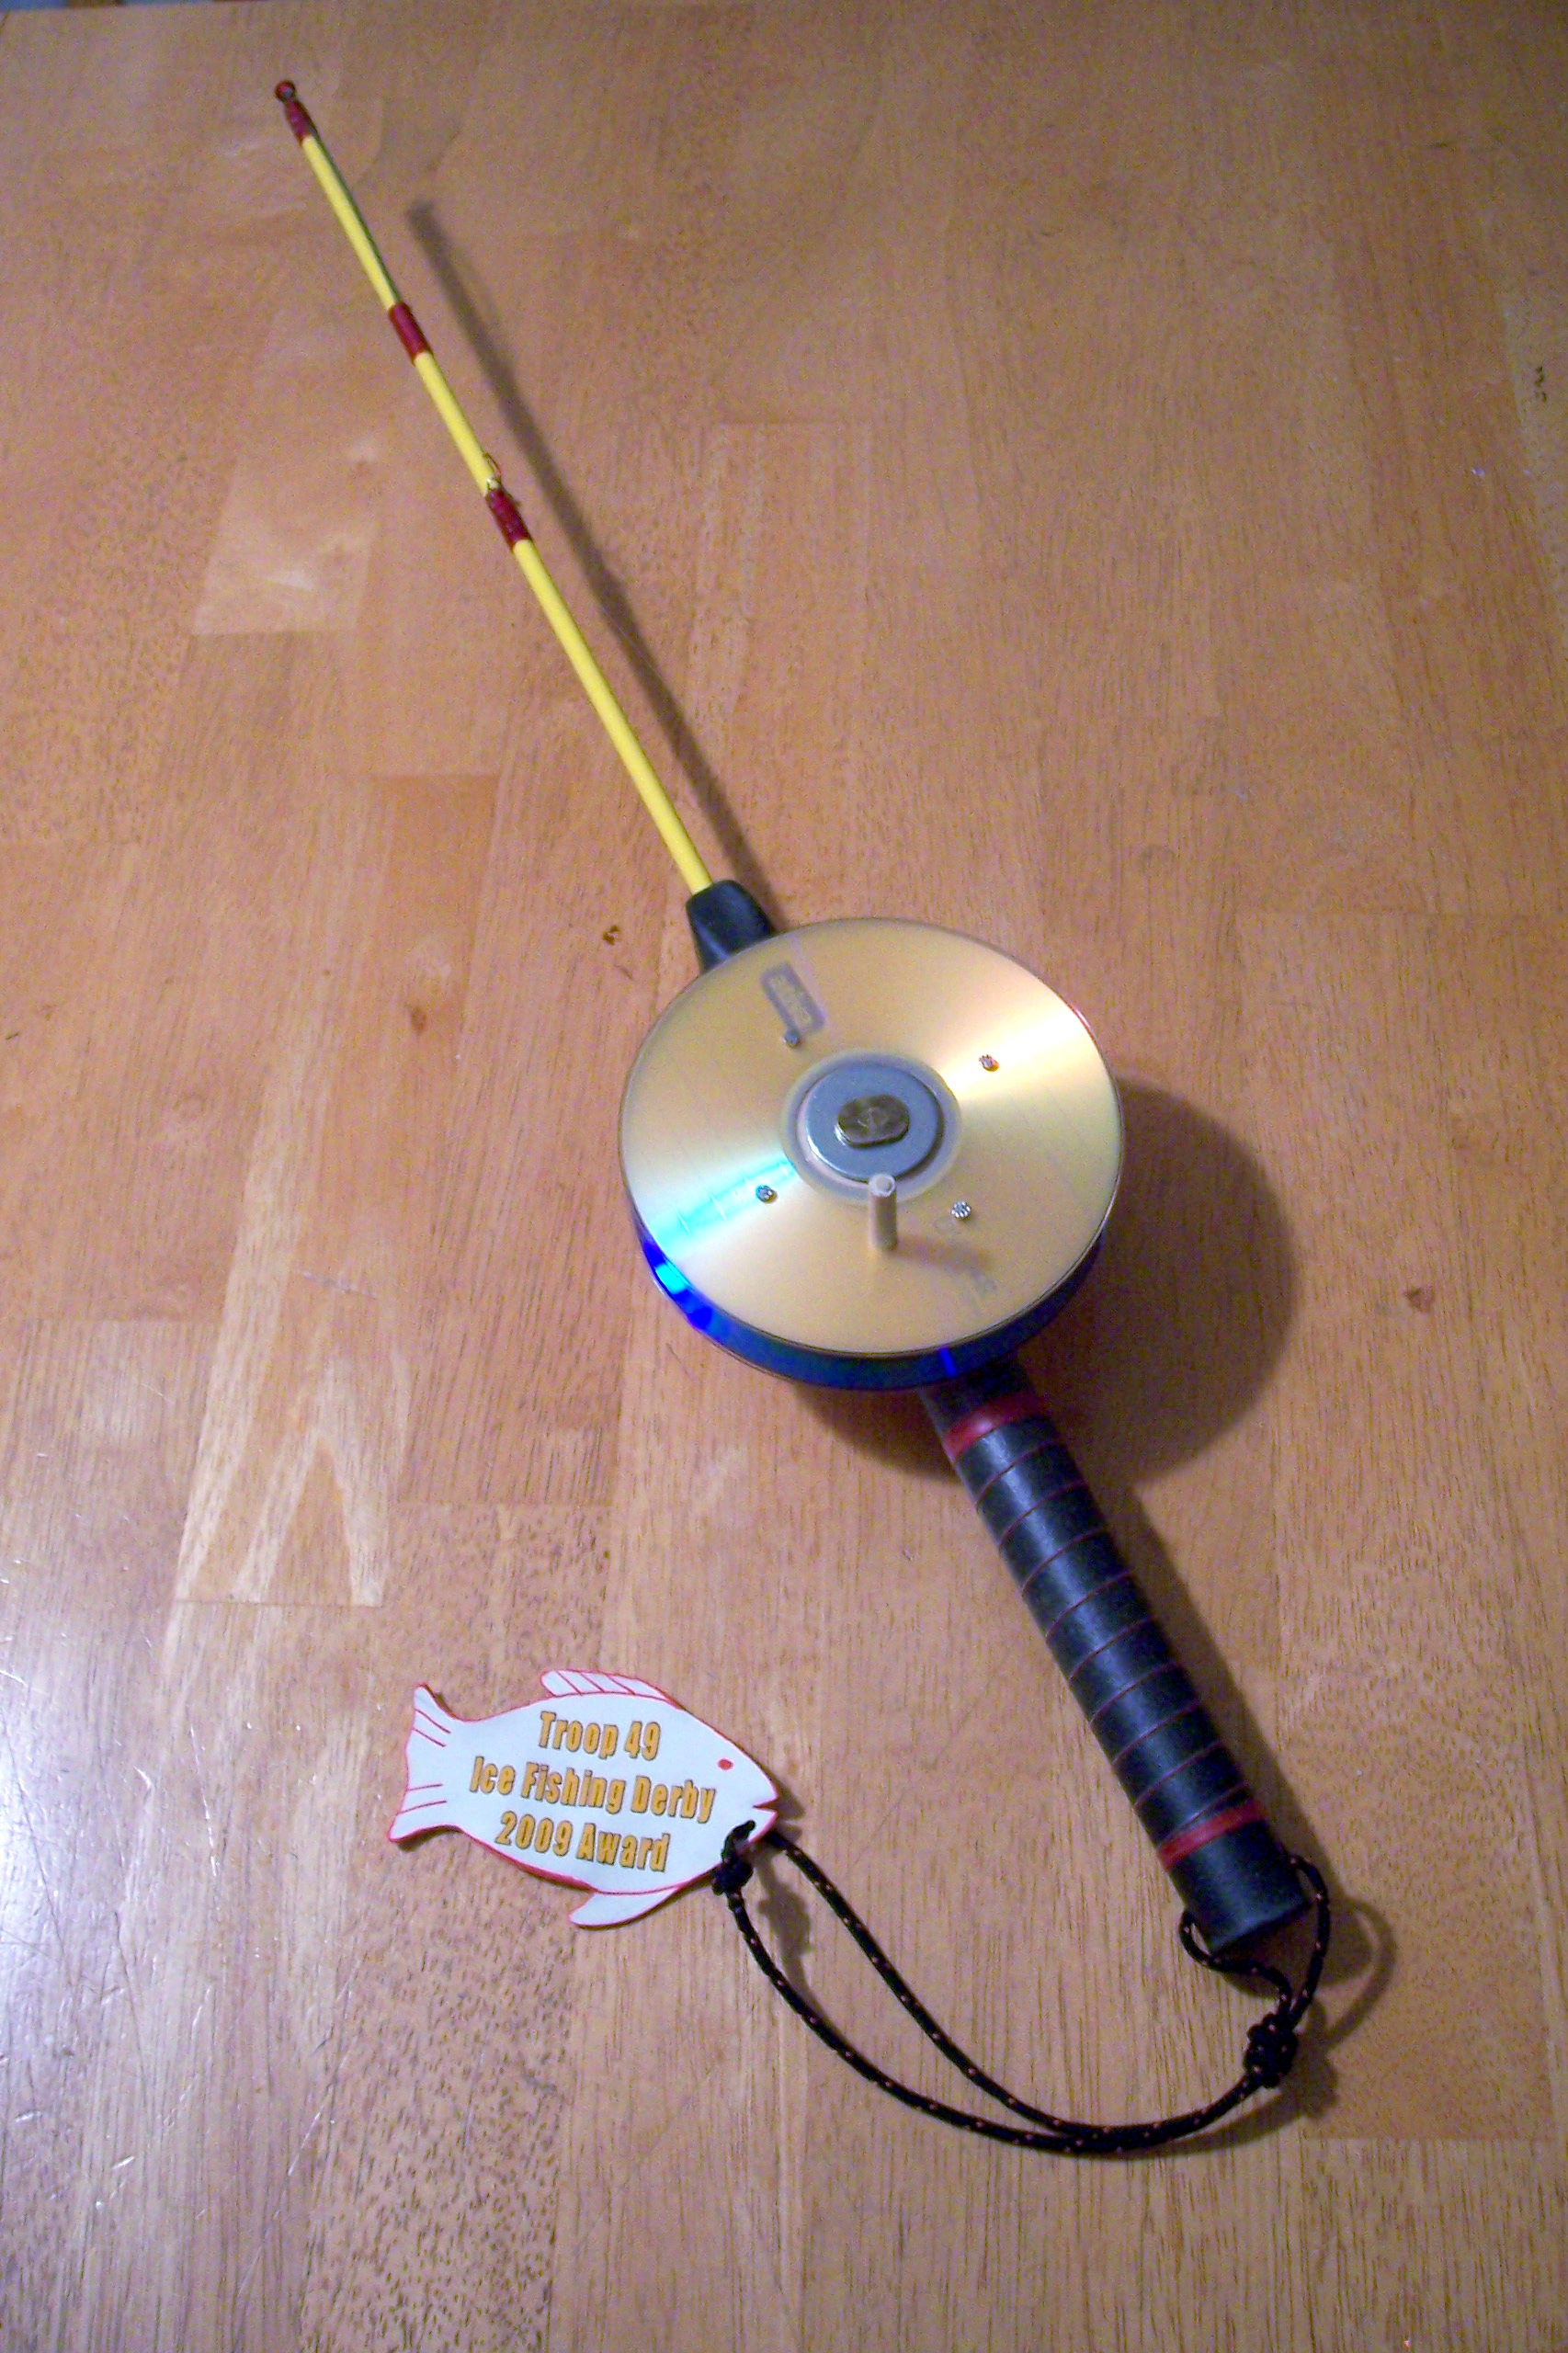 Build an Ice Fishing Pole